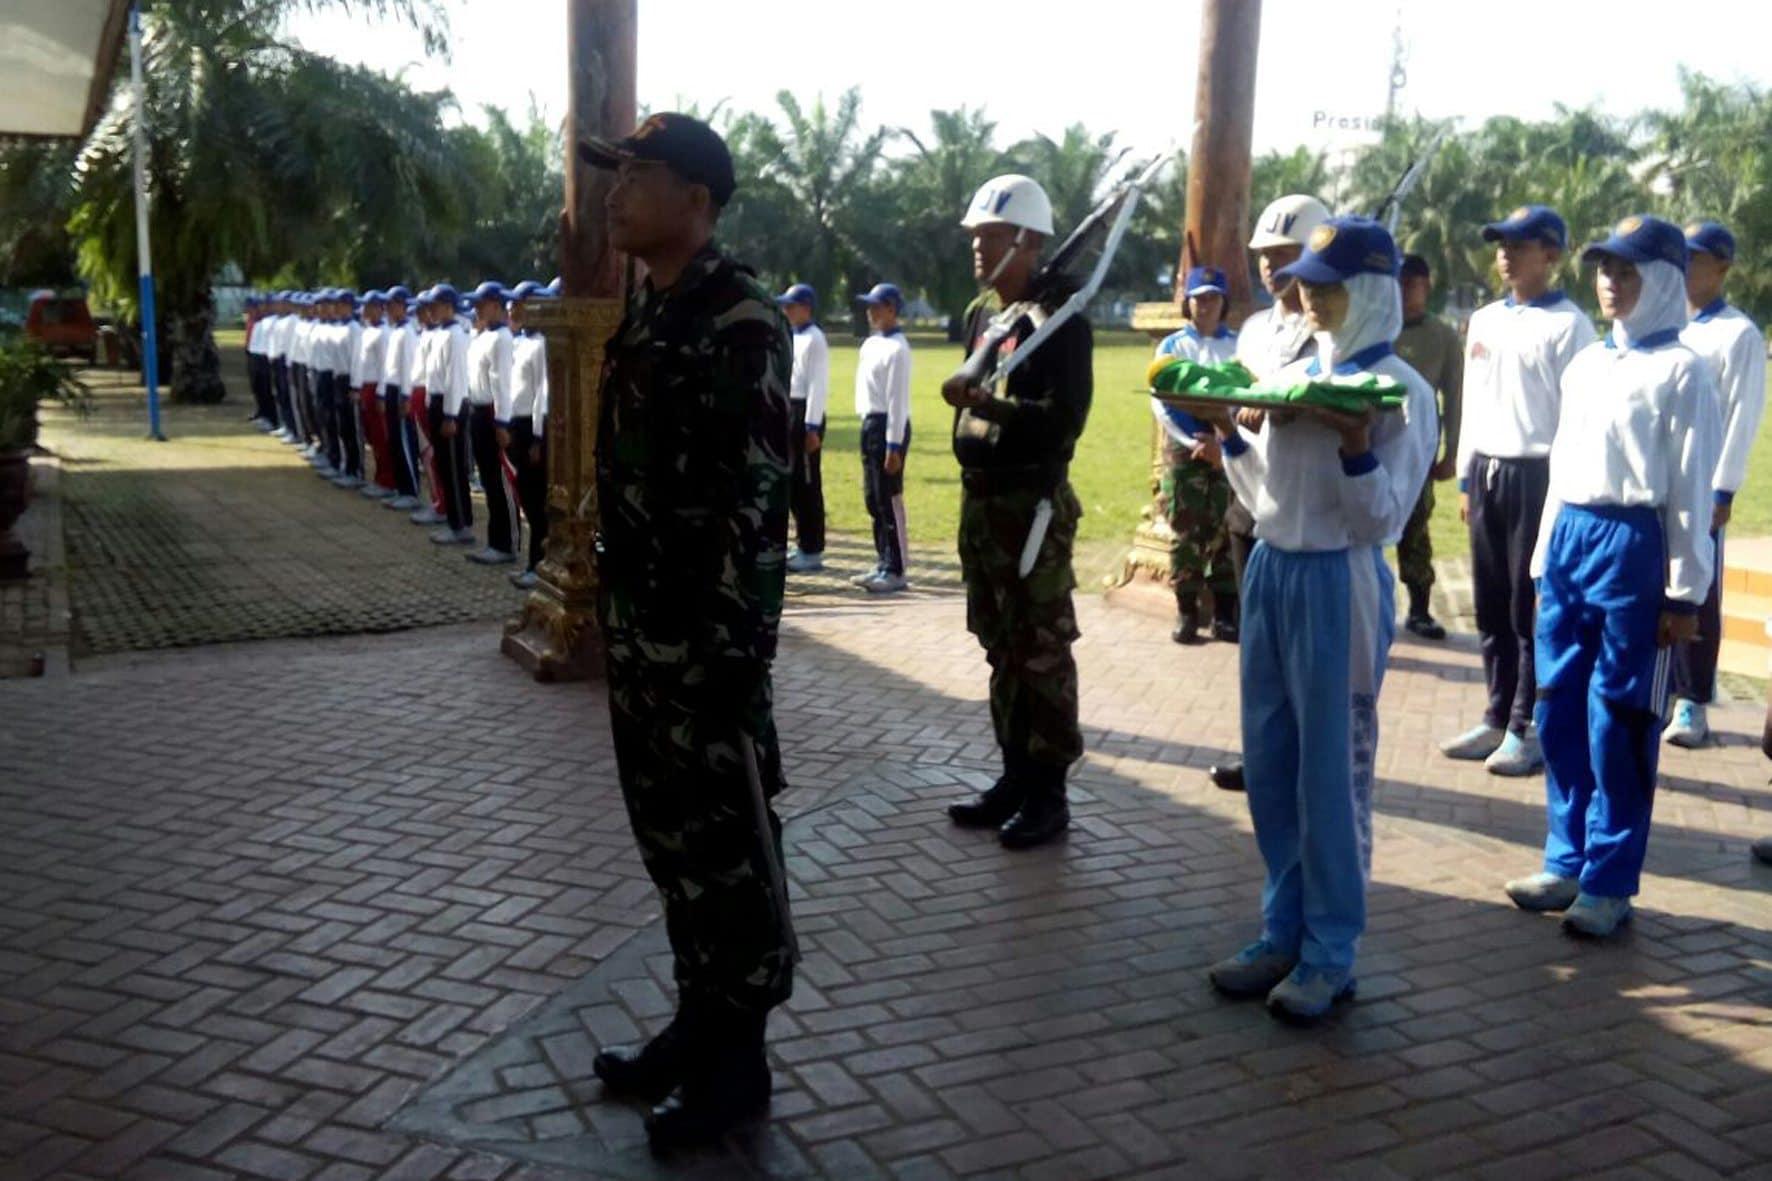 Latihan Paskibraka Di Aloen-Aloen Kota Madiun 4